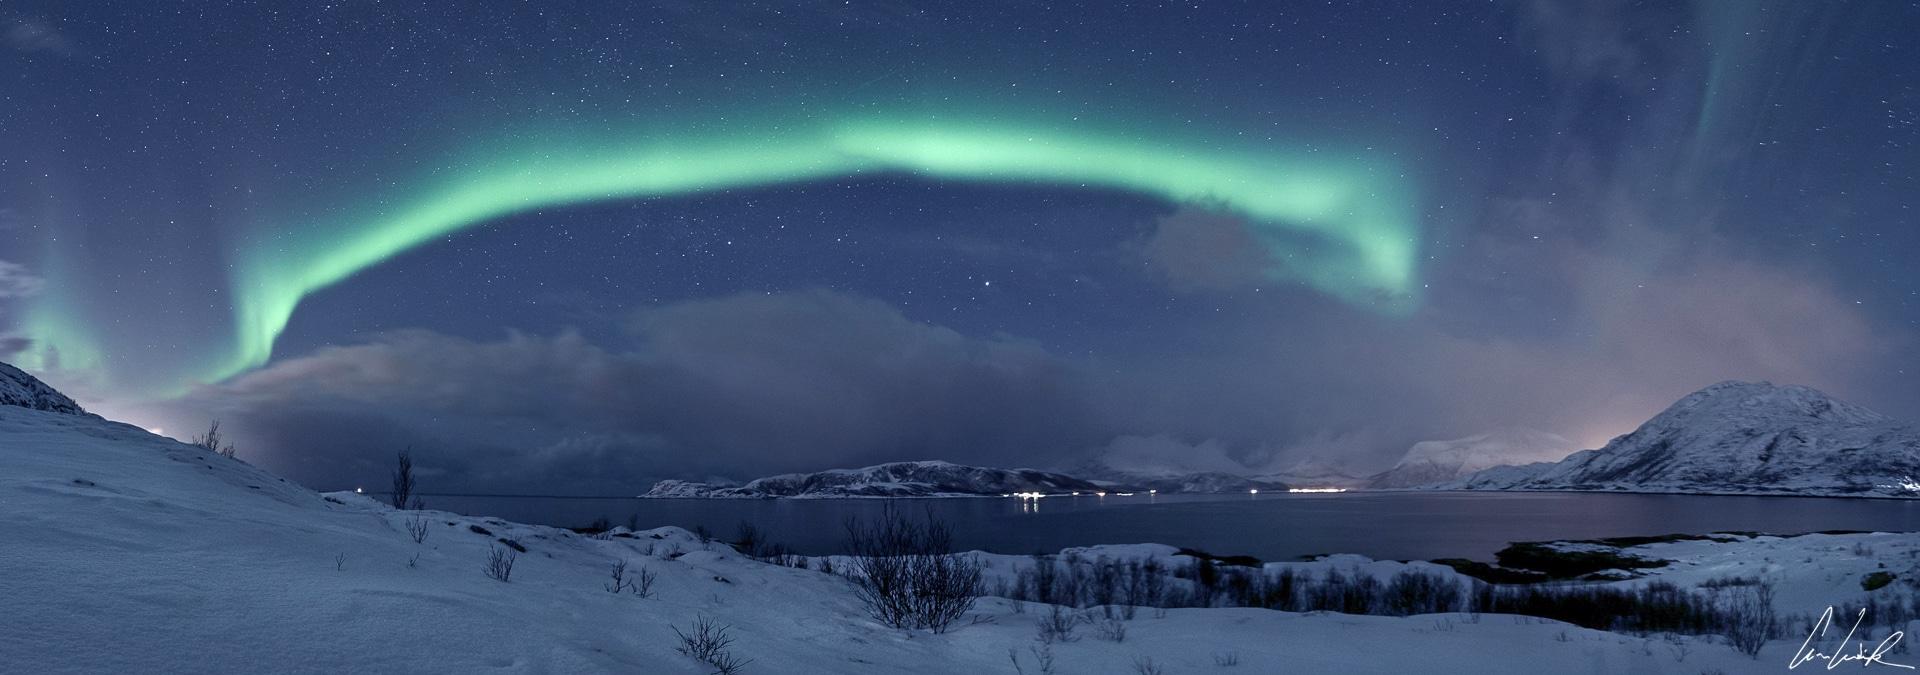 Lapland, Aurora Borealis Paradise